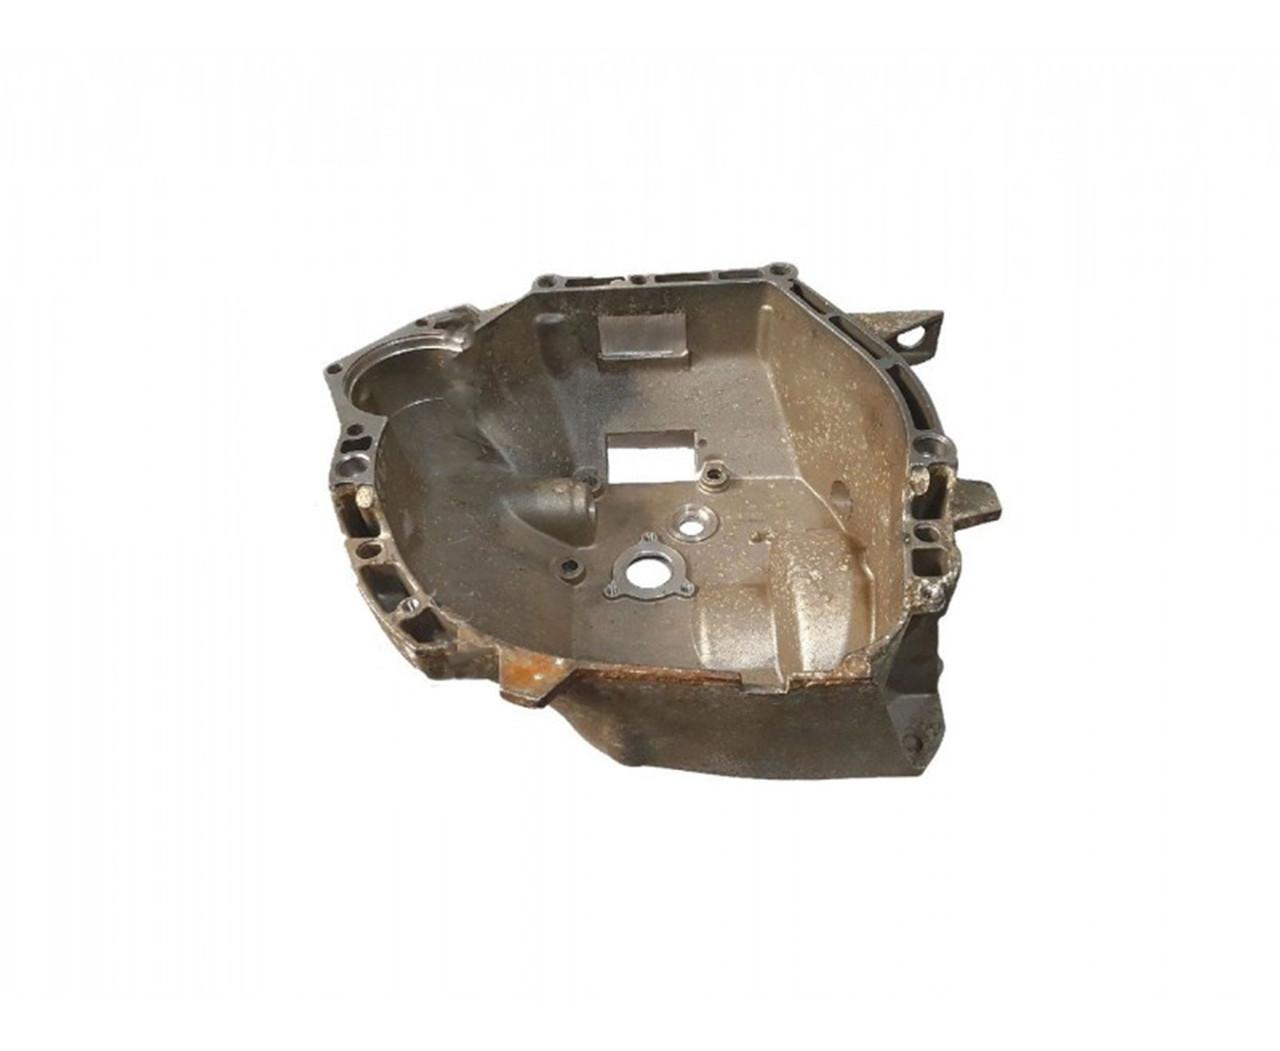 Картер сцепления Москвич 2141 для двигателя ВАЗ-2106